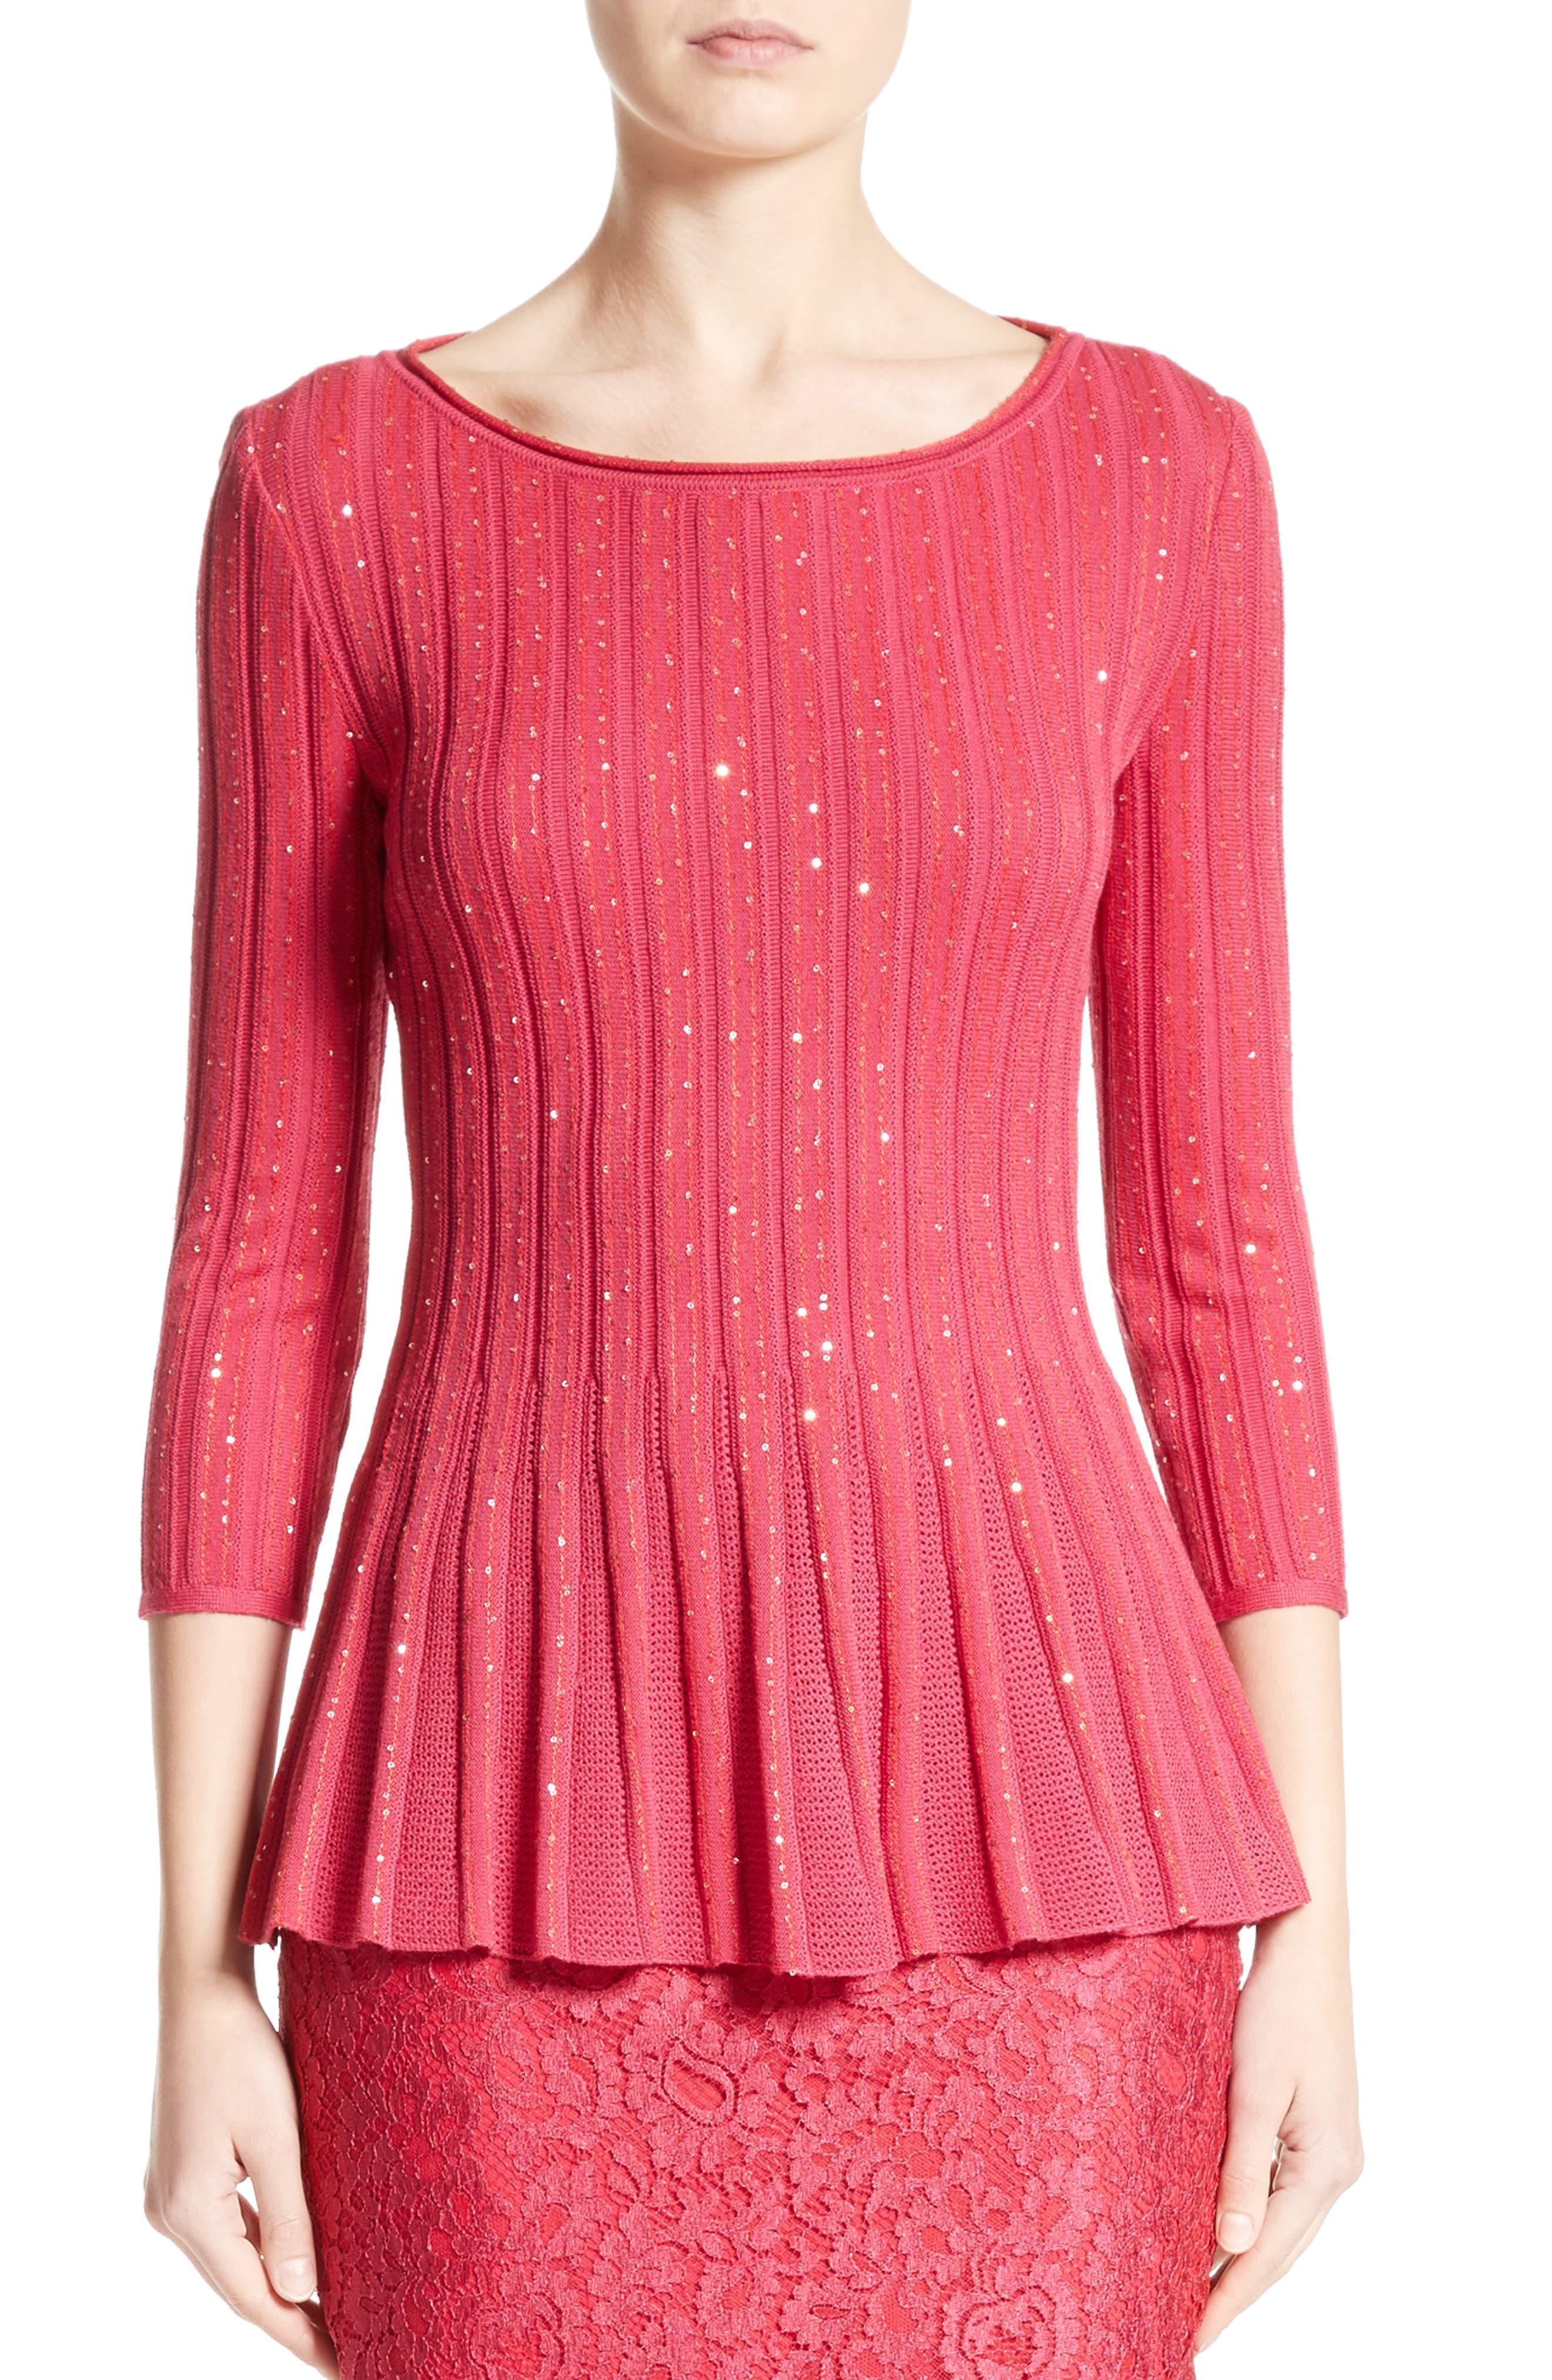 Chriag Sequin Knit Peplum Top,                         Main,                         color,